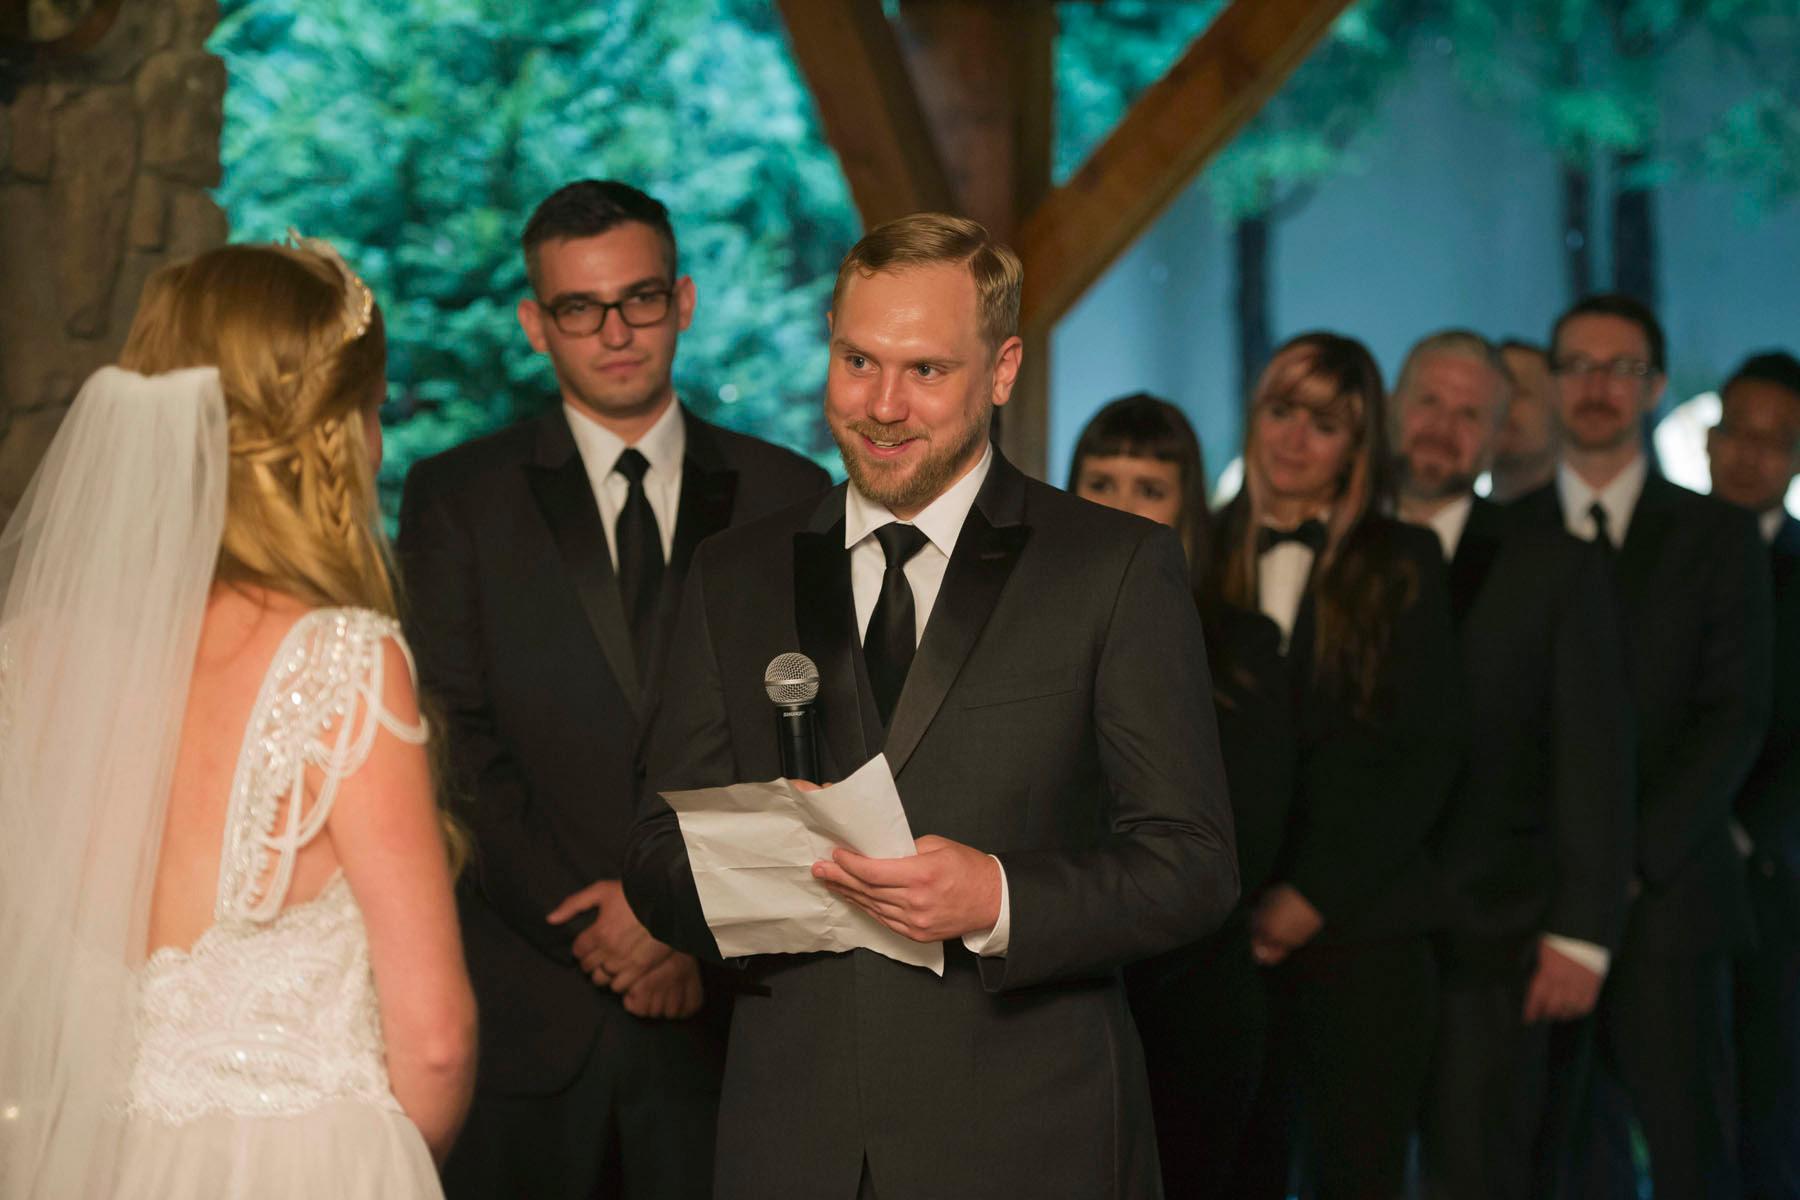 Bucks_County_wedding_photographer_Stroudsmoor_country_inn_wedding_Philadelphia_wedding_photographer_16_groom_reads_vows.JPG